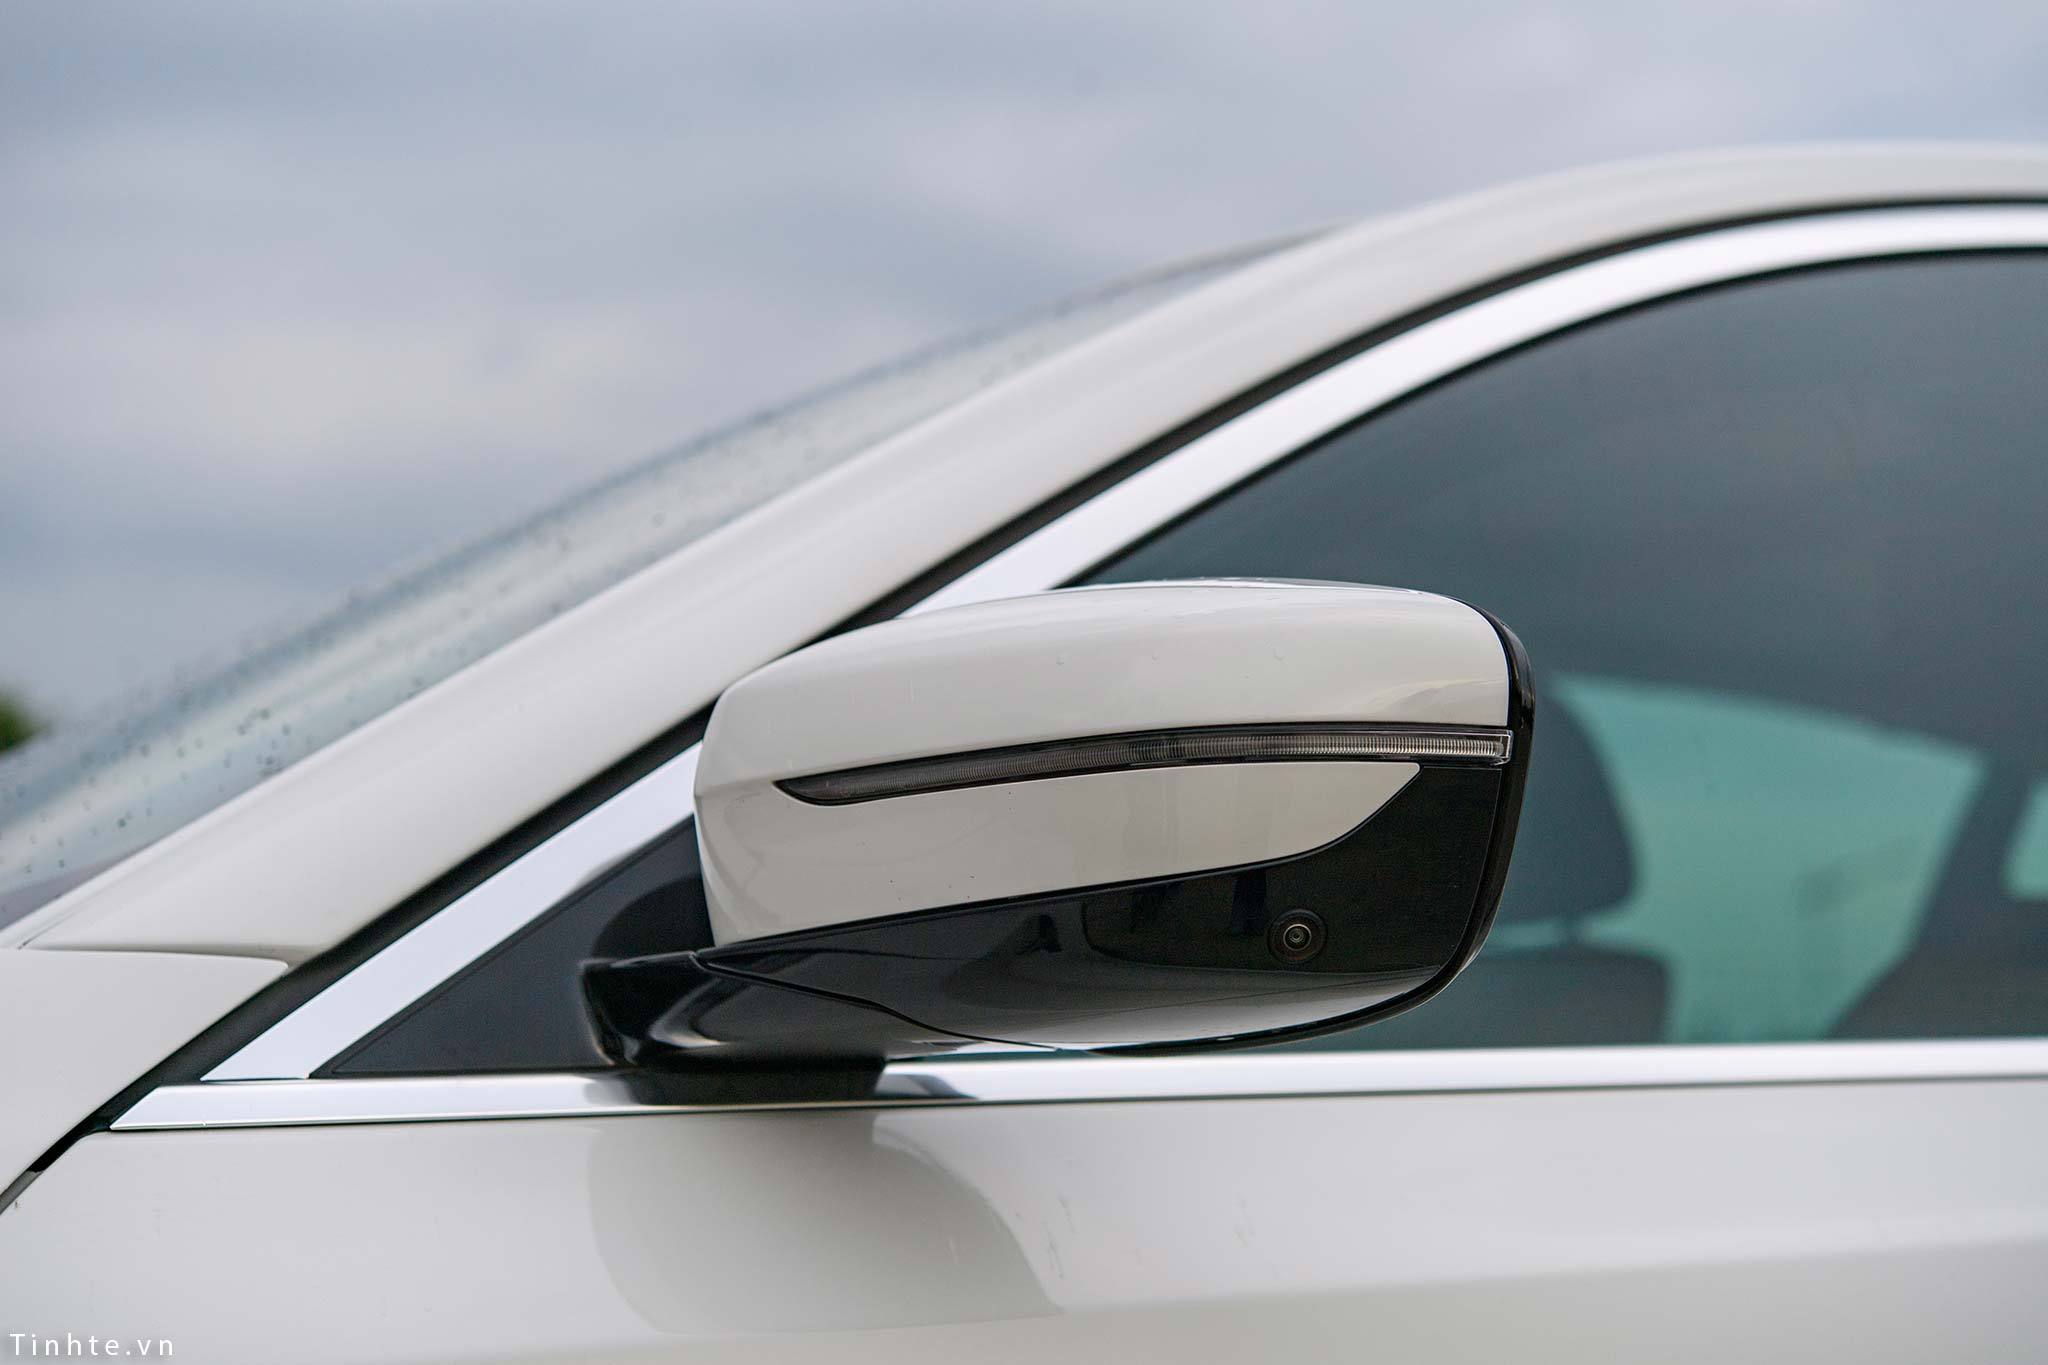 BMW_530i_G30_tinhte_10.jpg